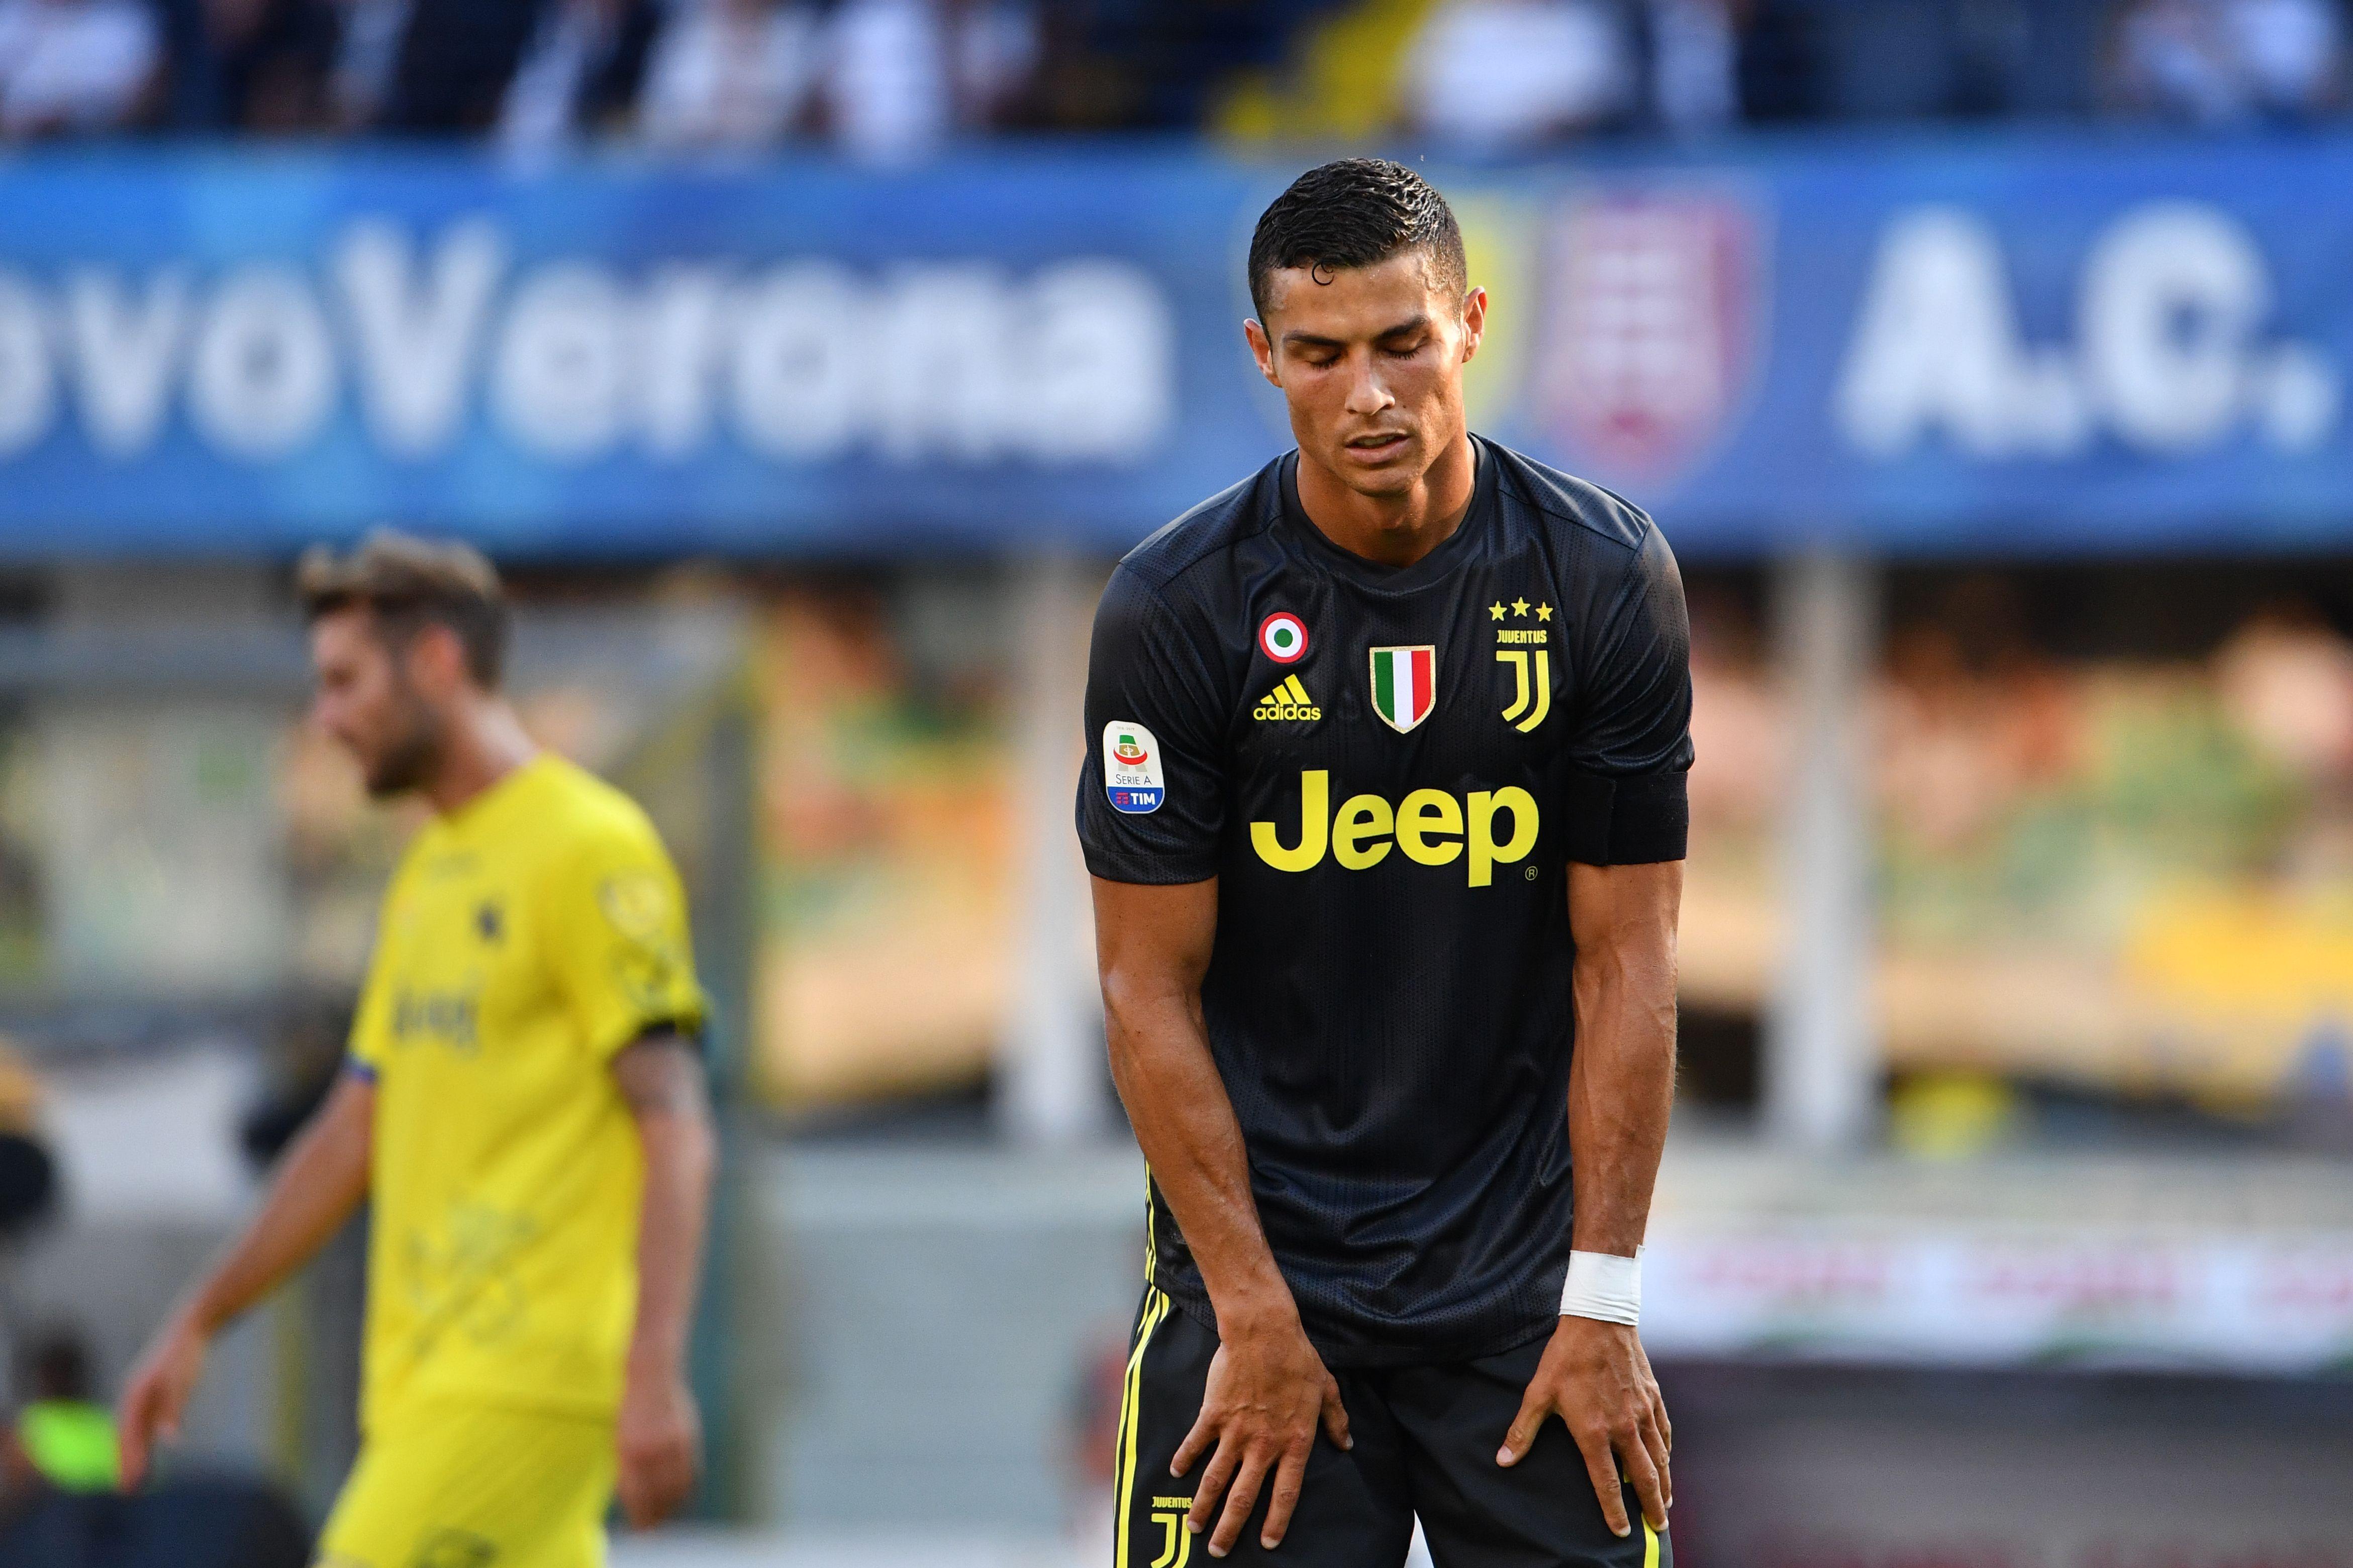 Cristiano Ronaldo Chievo Juventus Serie A 2018-19